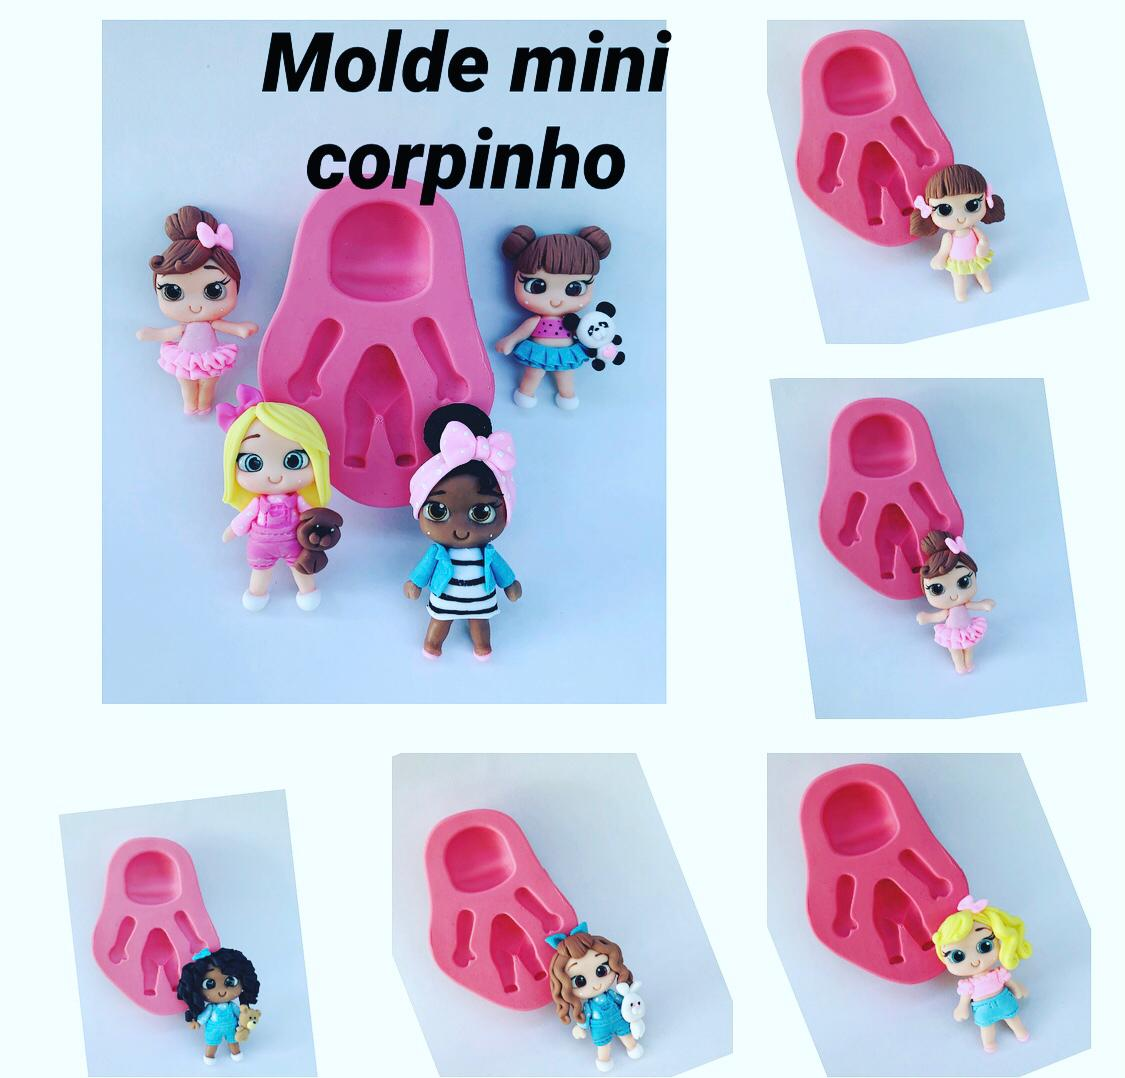 MOLDE MINI CORPINHO